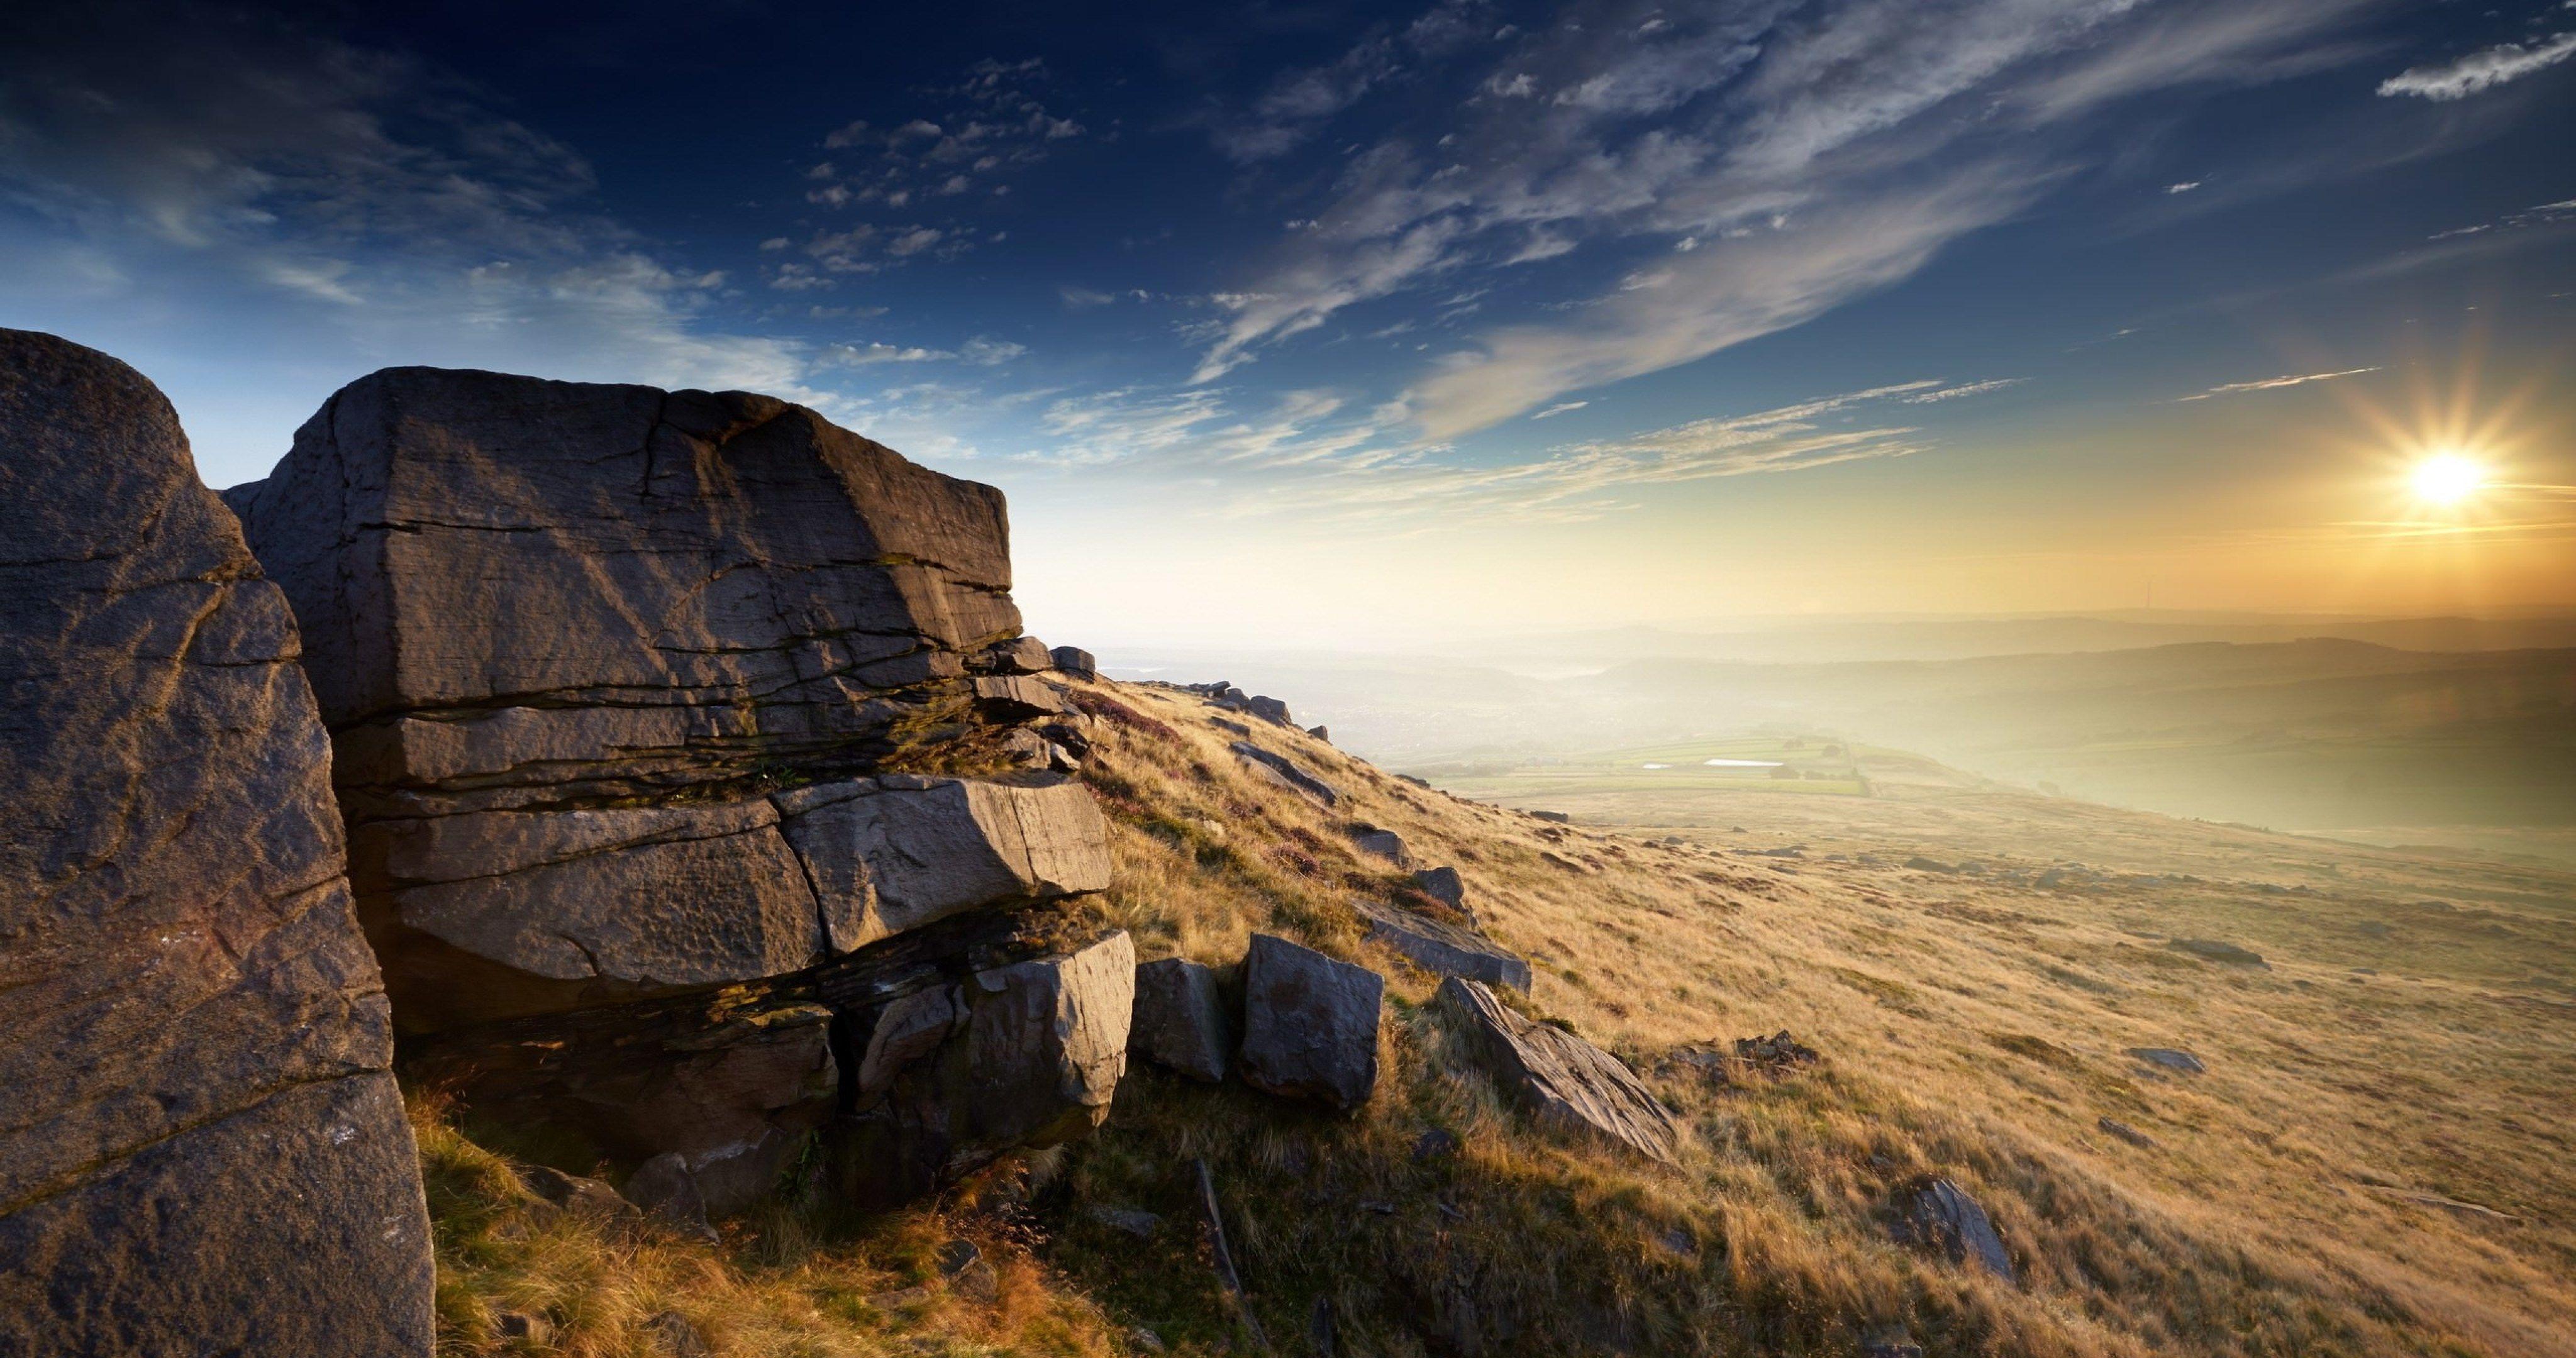 Sunset Mountain Landscape 4k Ultra Hd Wallpaper Mountain